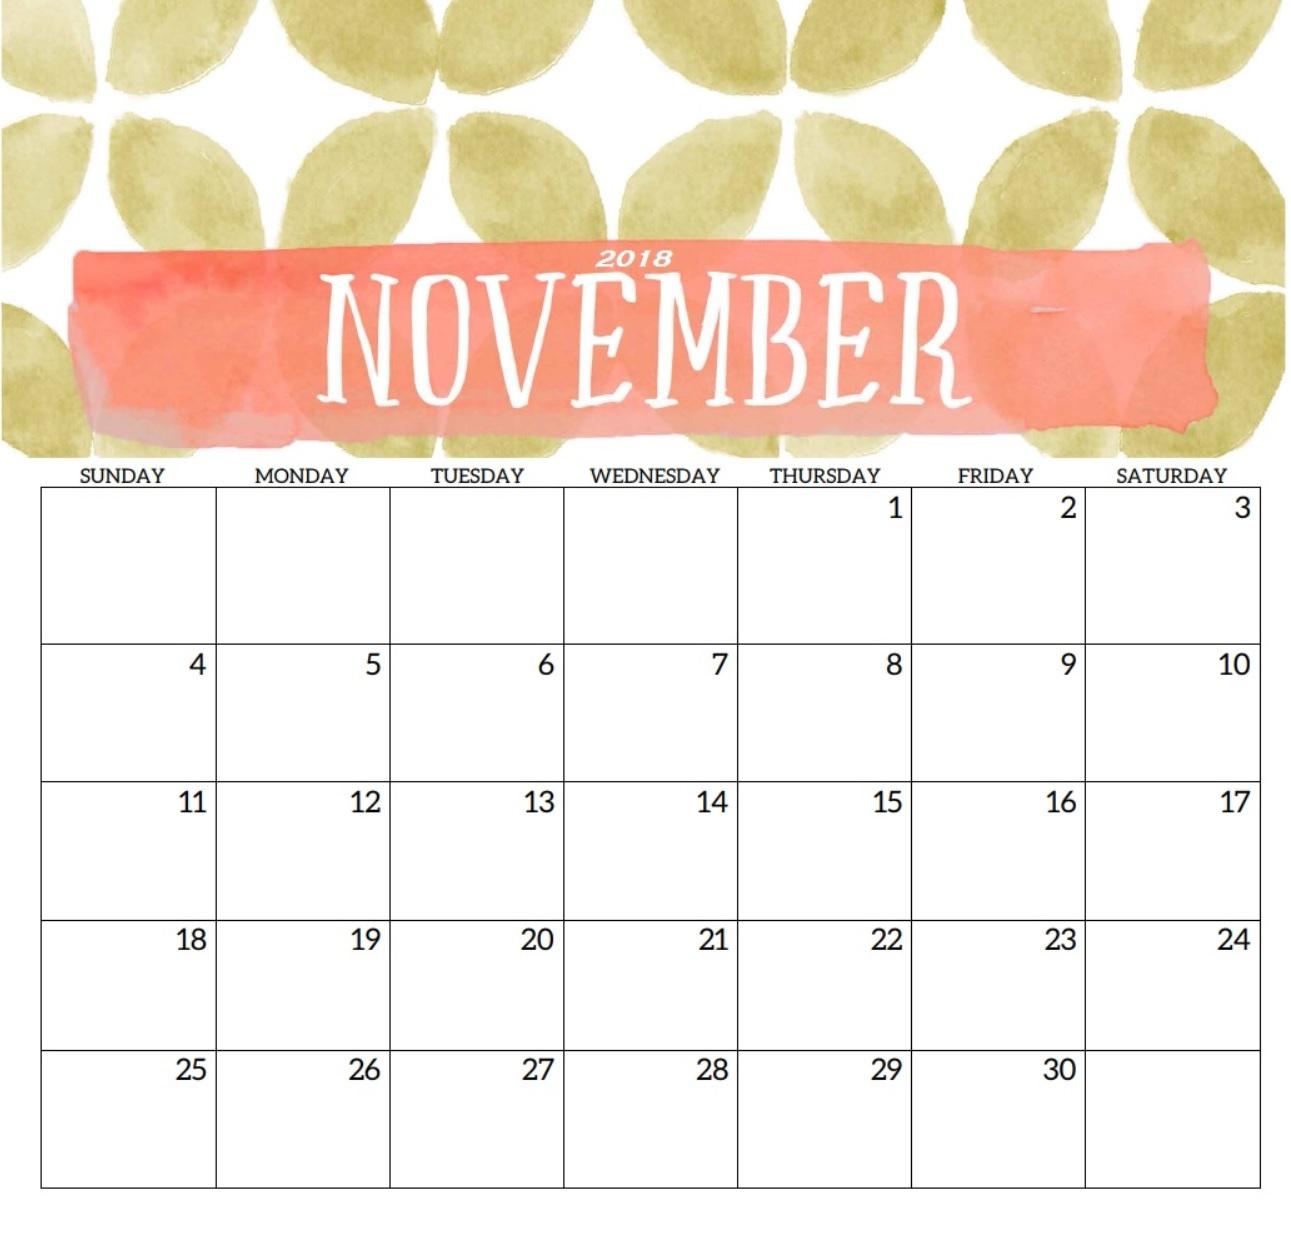 Calendar November 2018 Template